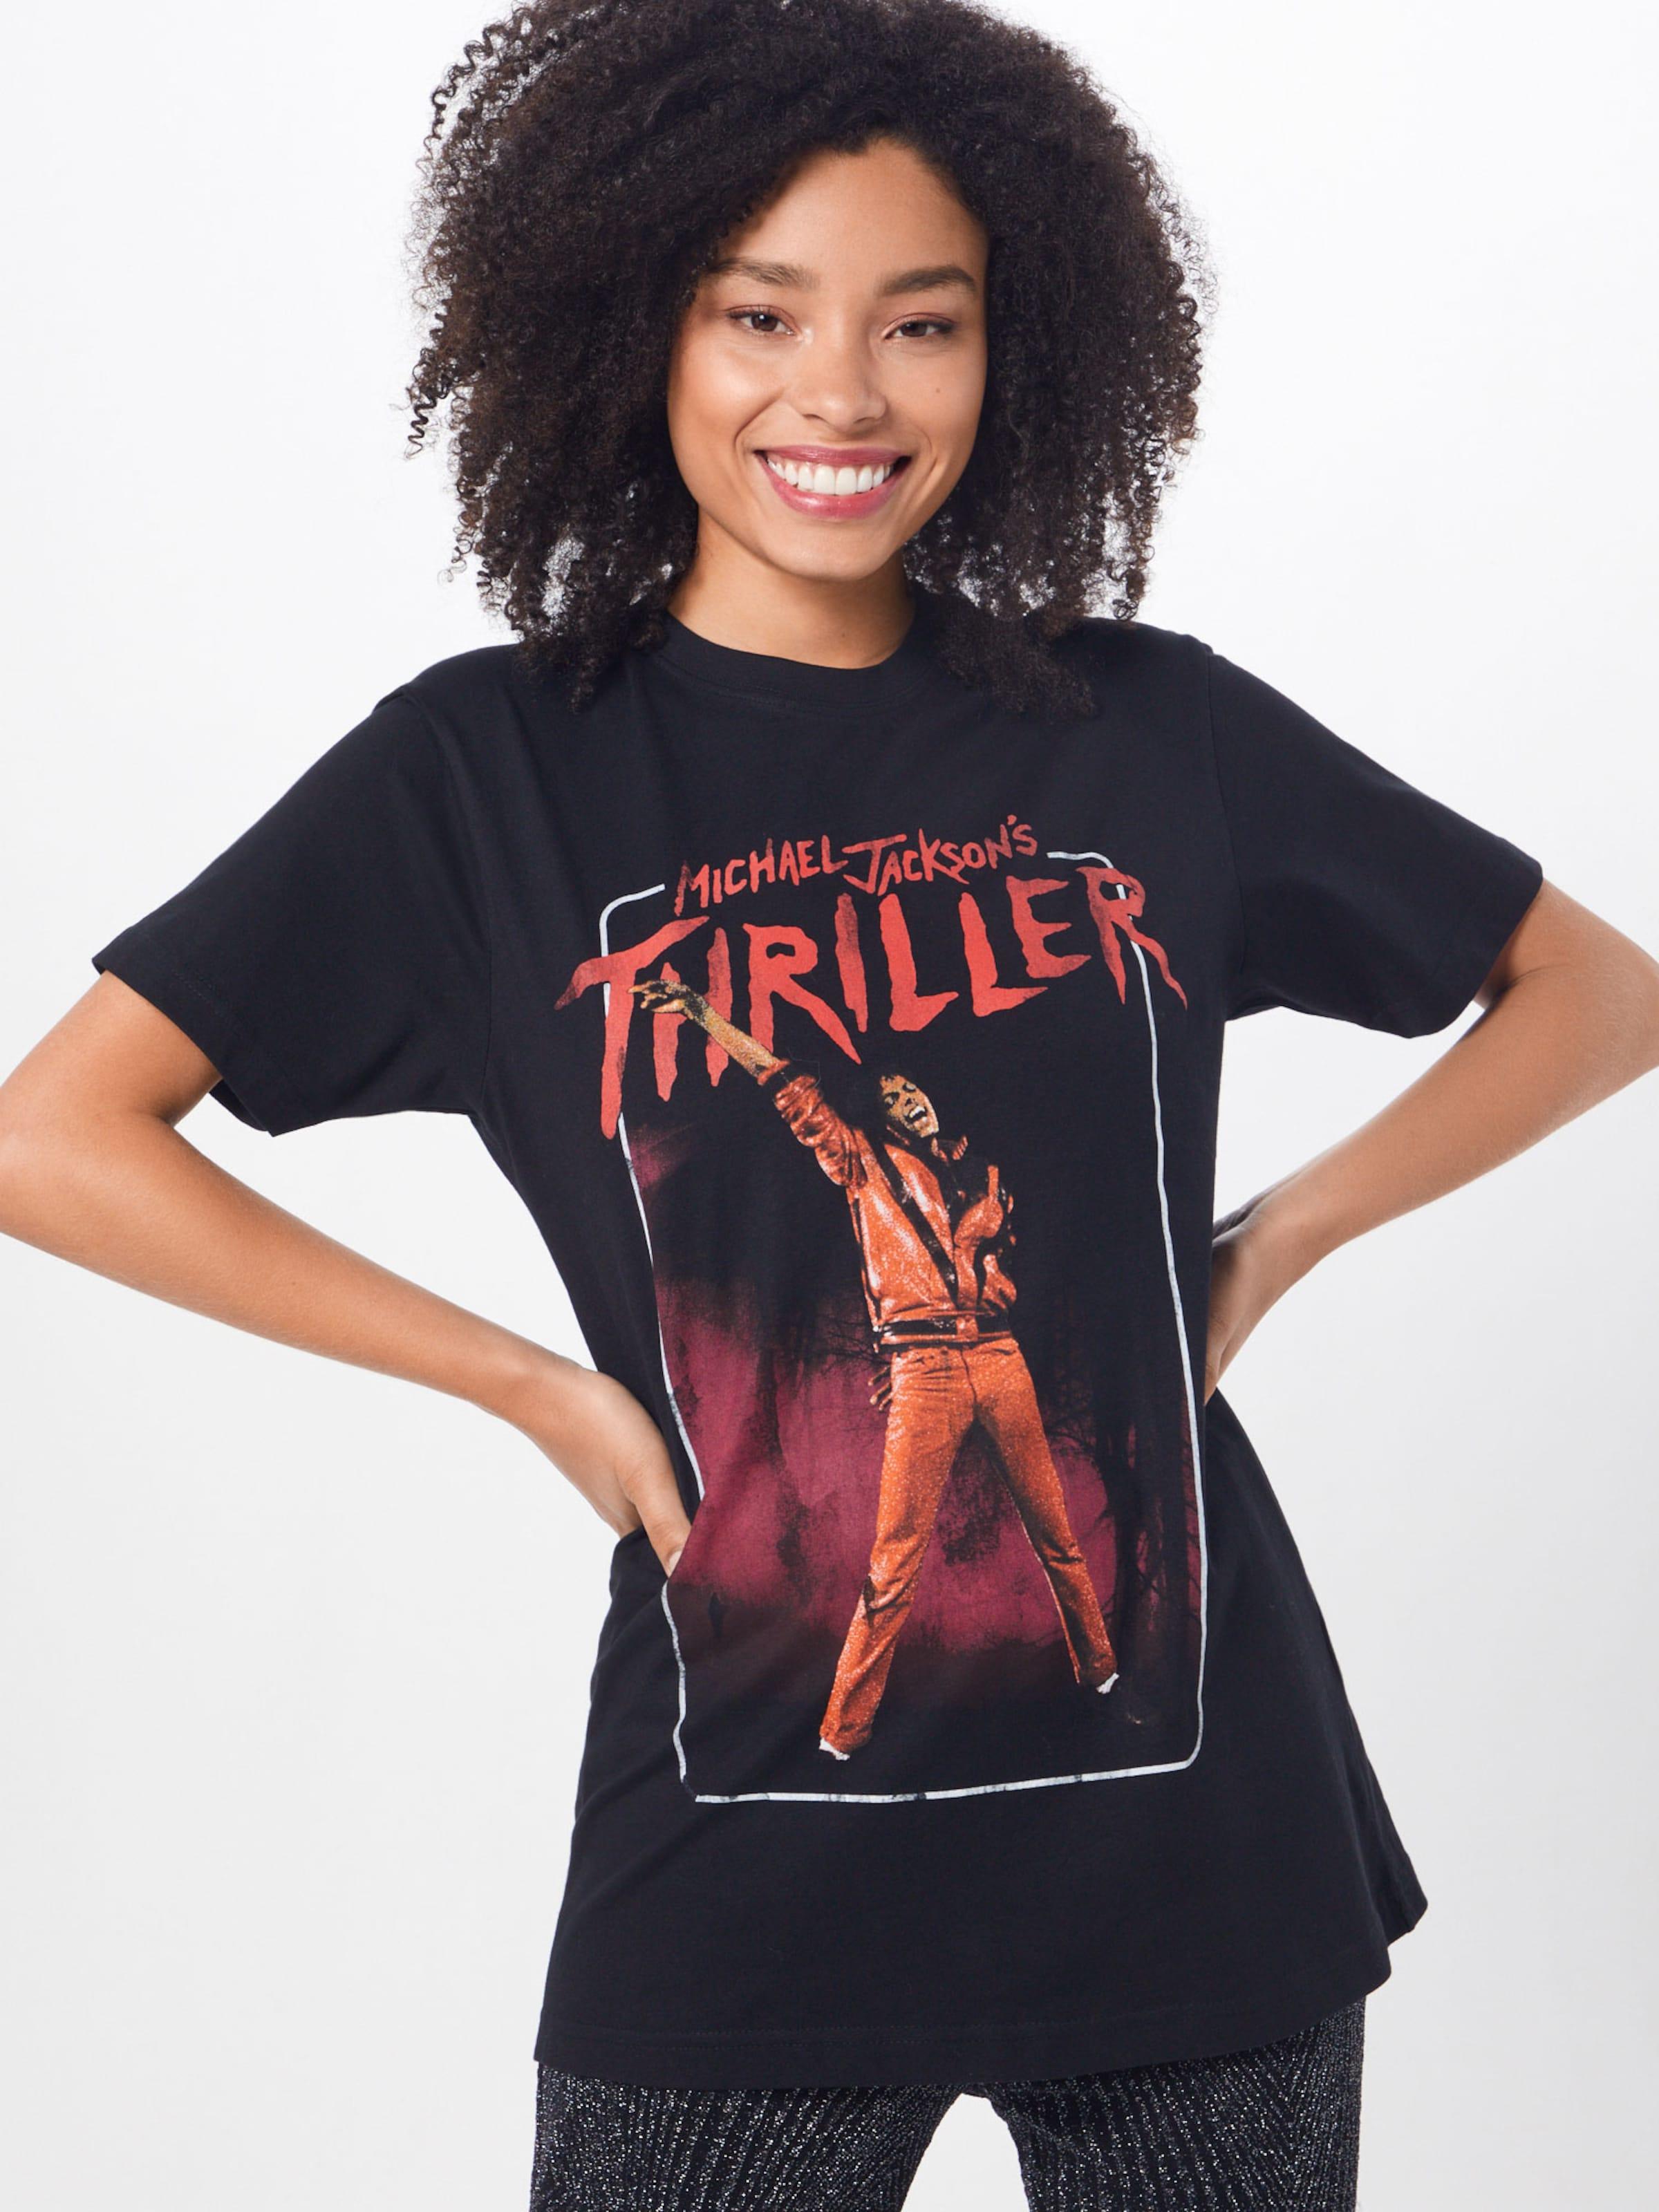 Tee' T Thriller shirt RougeNoir Jackson En Merchcode 'michael Video pUzSMV